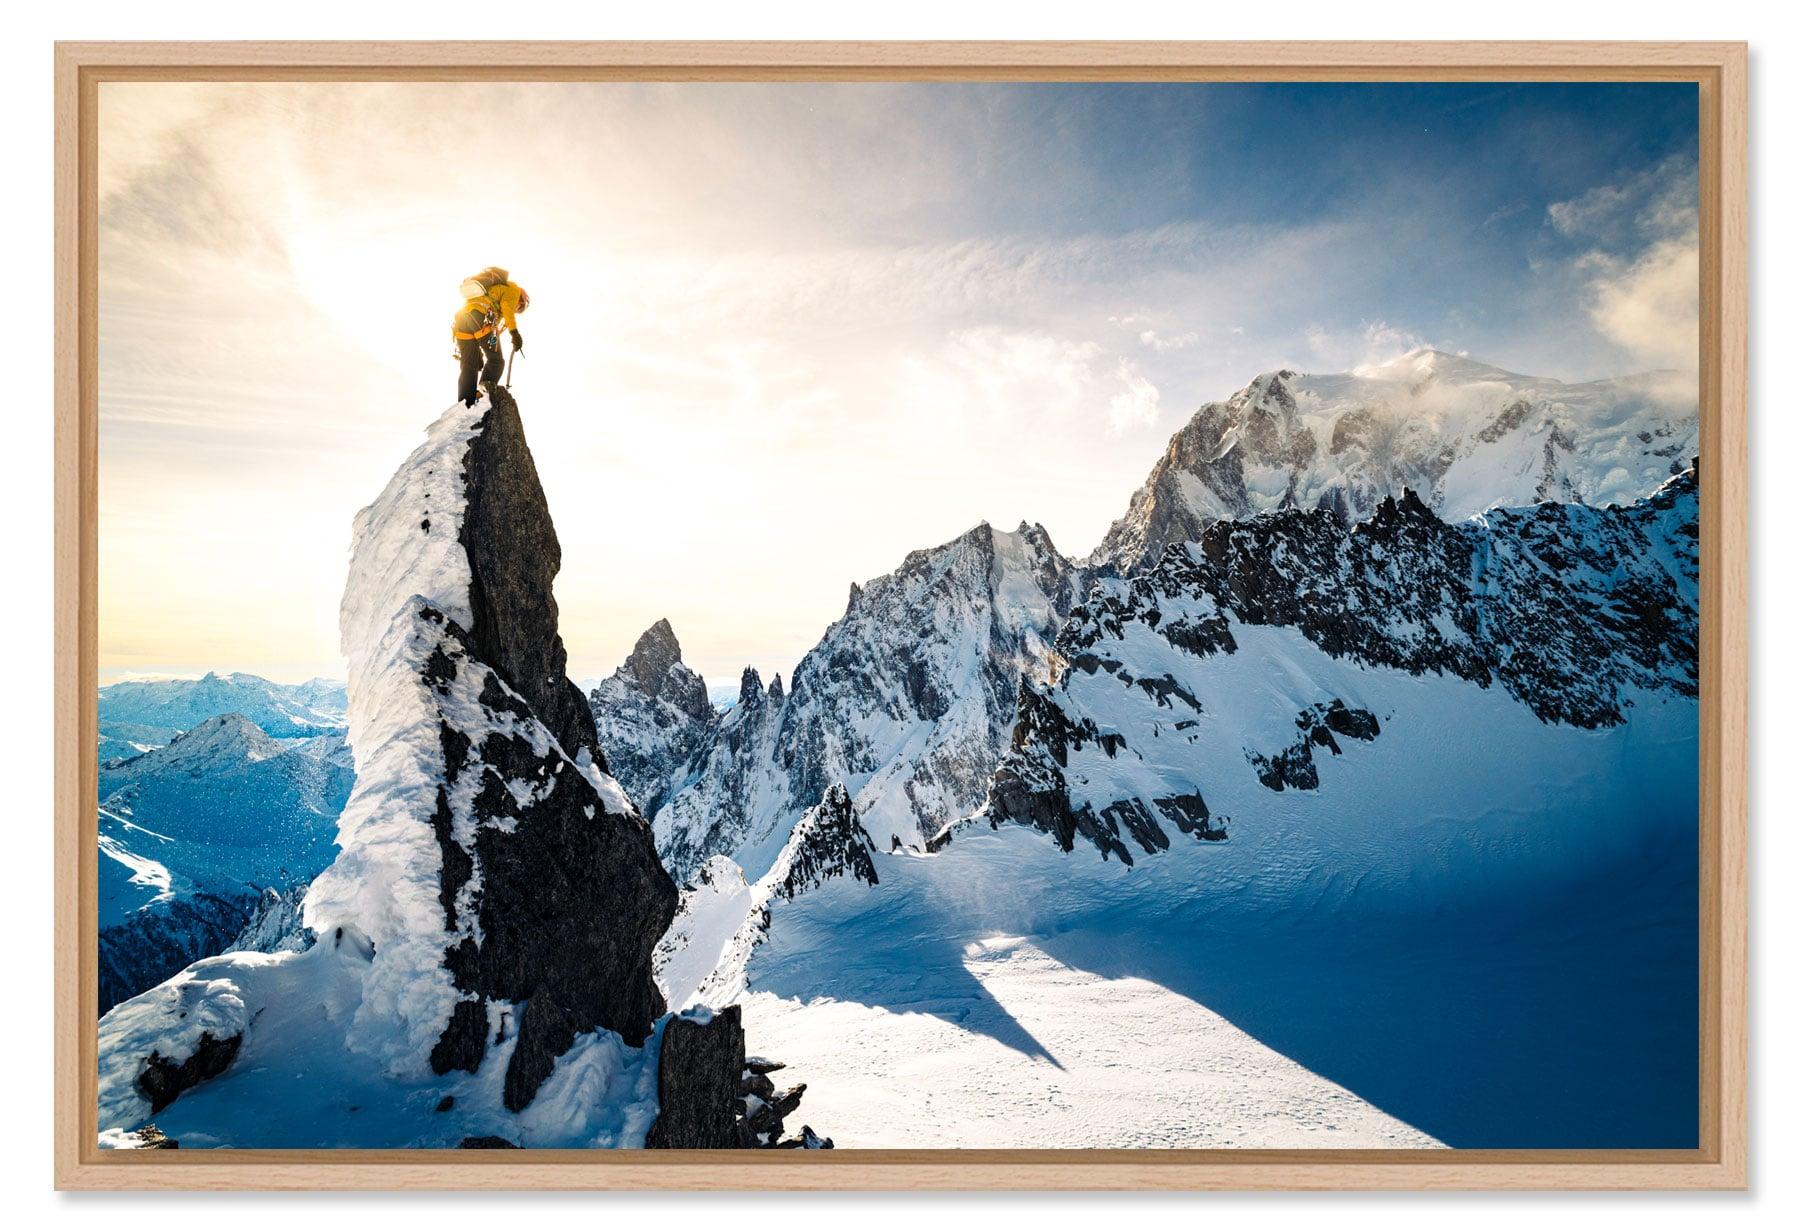 Tirage photo d'alpinisme et d'escalade